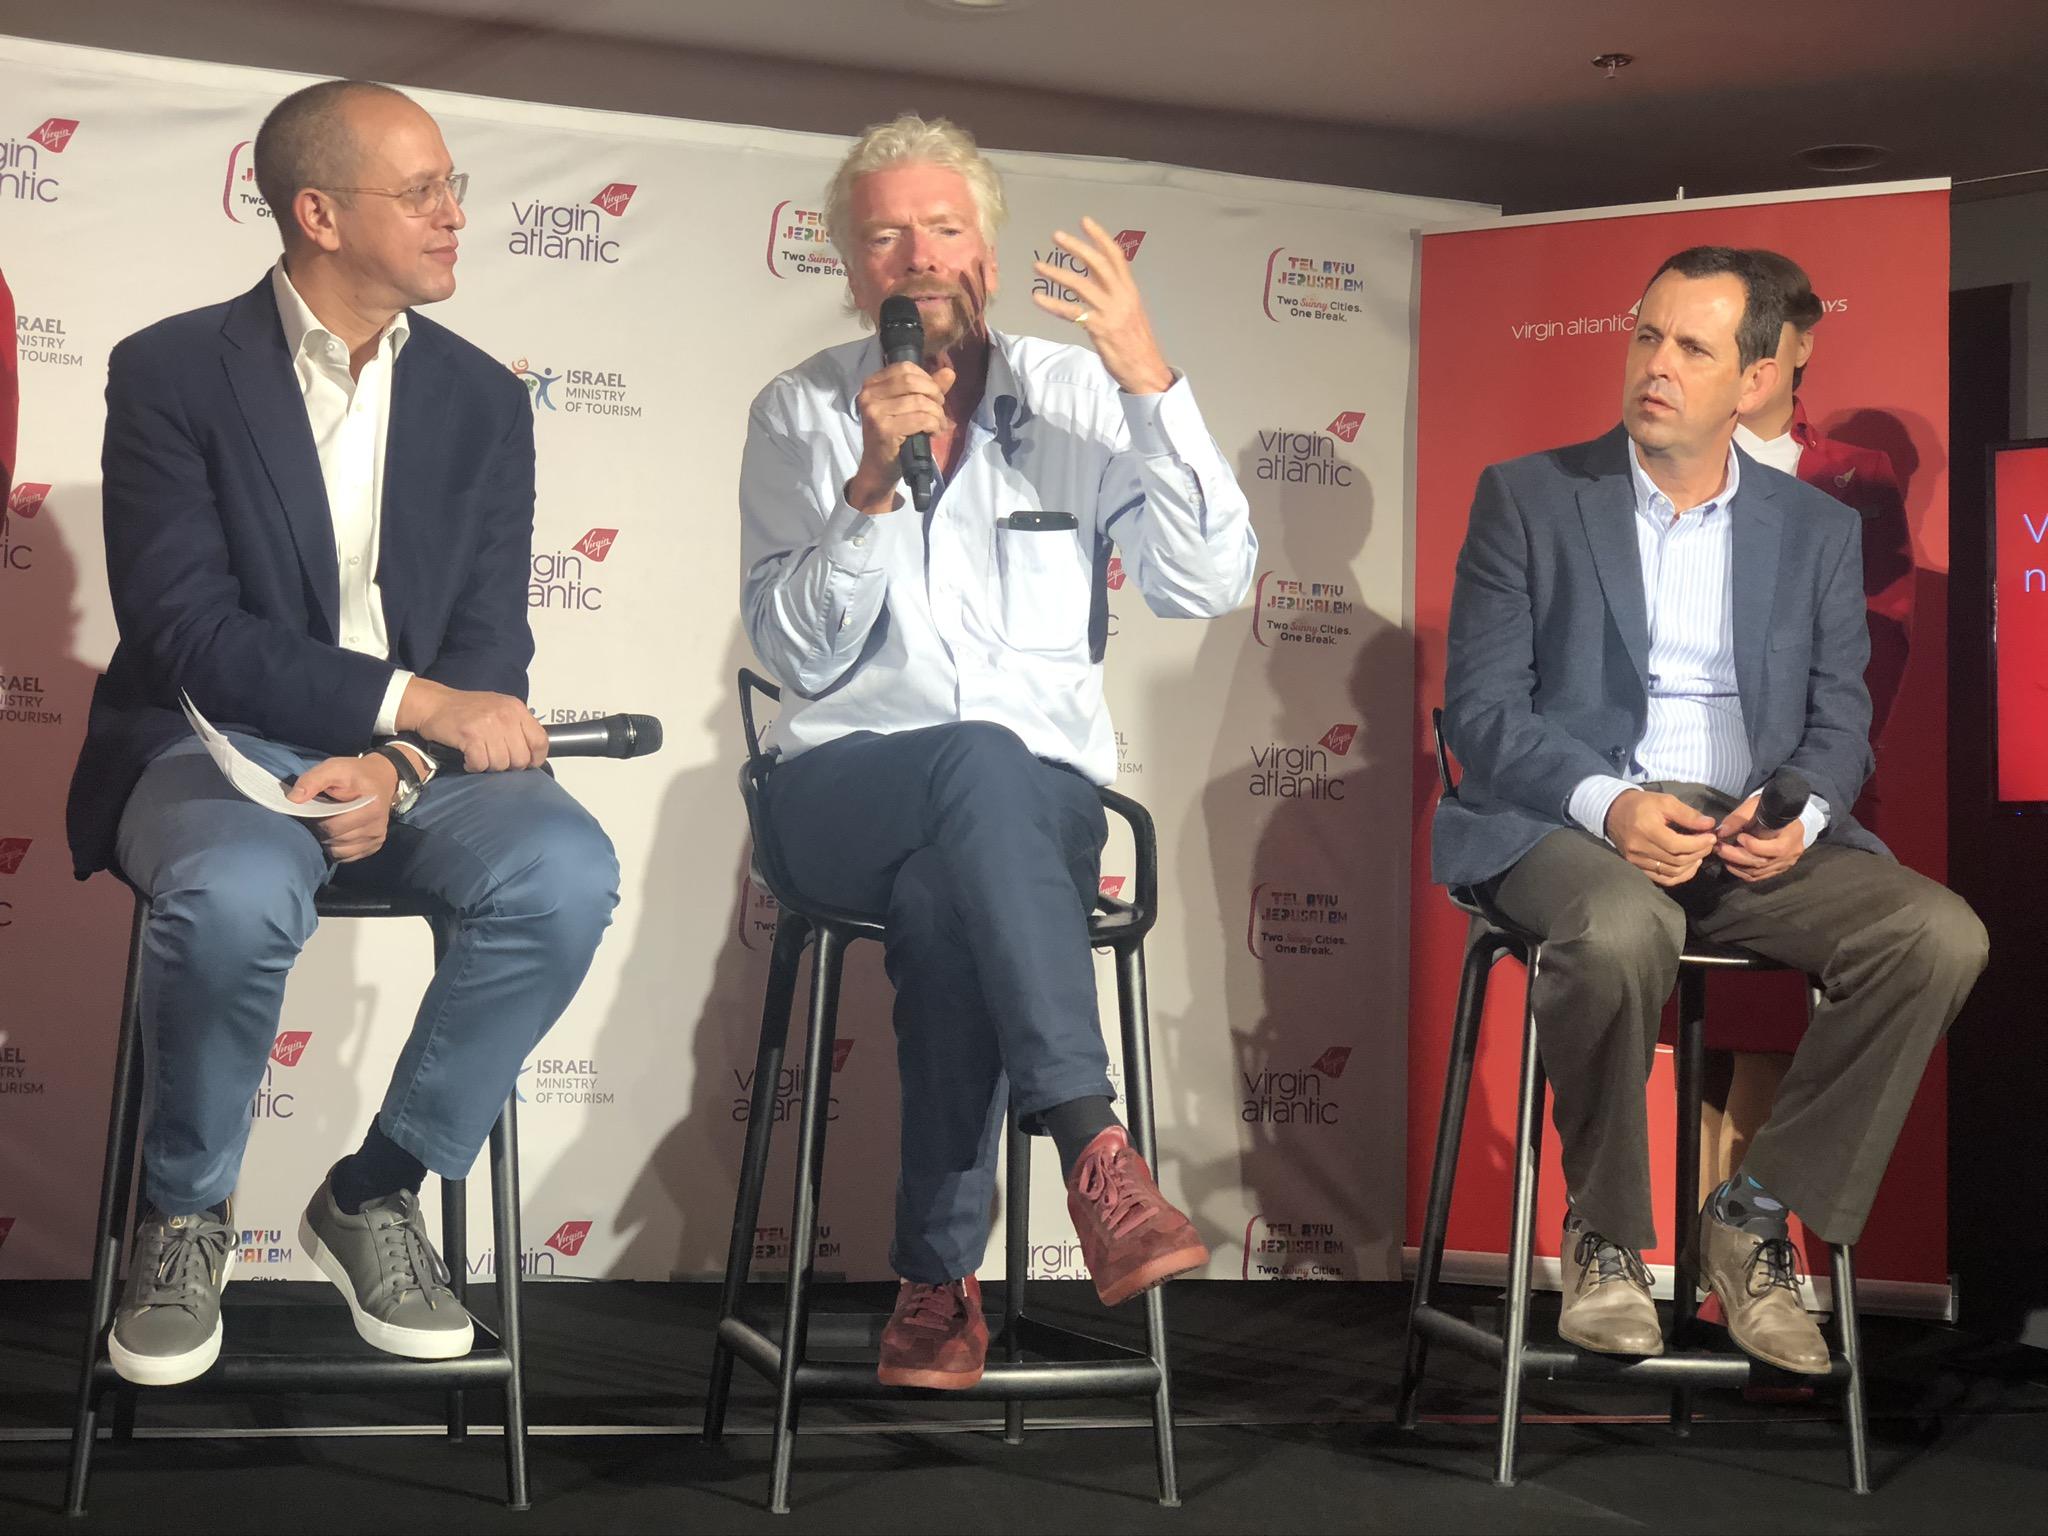 Virgin Atlantic Tel Aviv Richard Branson